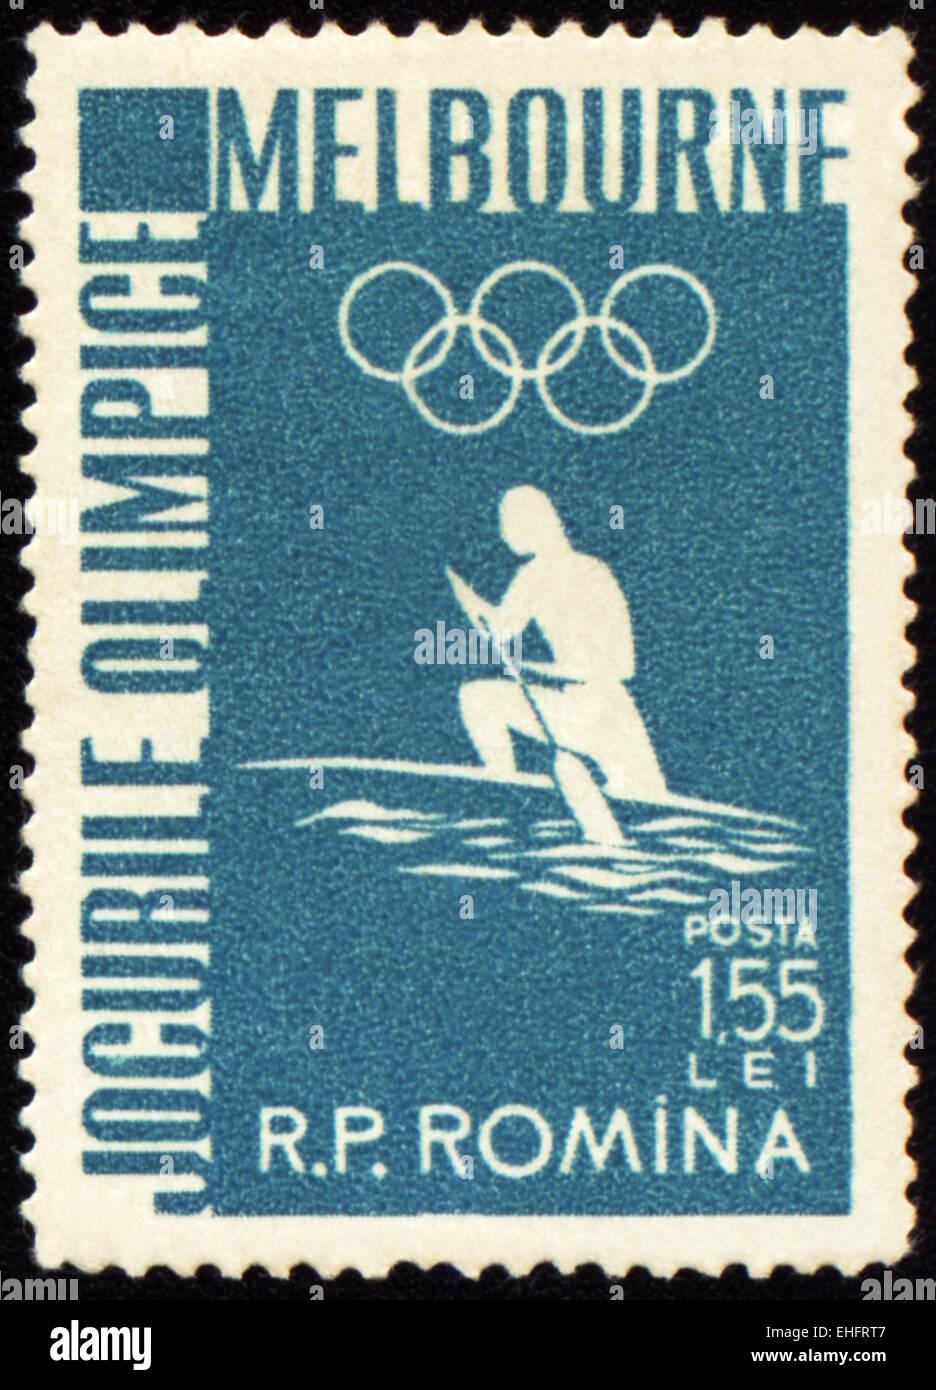 1956 Postage Stamp Stock Photos Amp 1956 Postage Stamp Stock